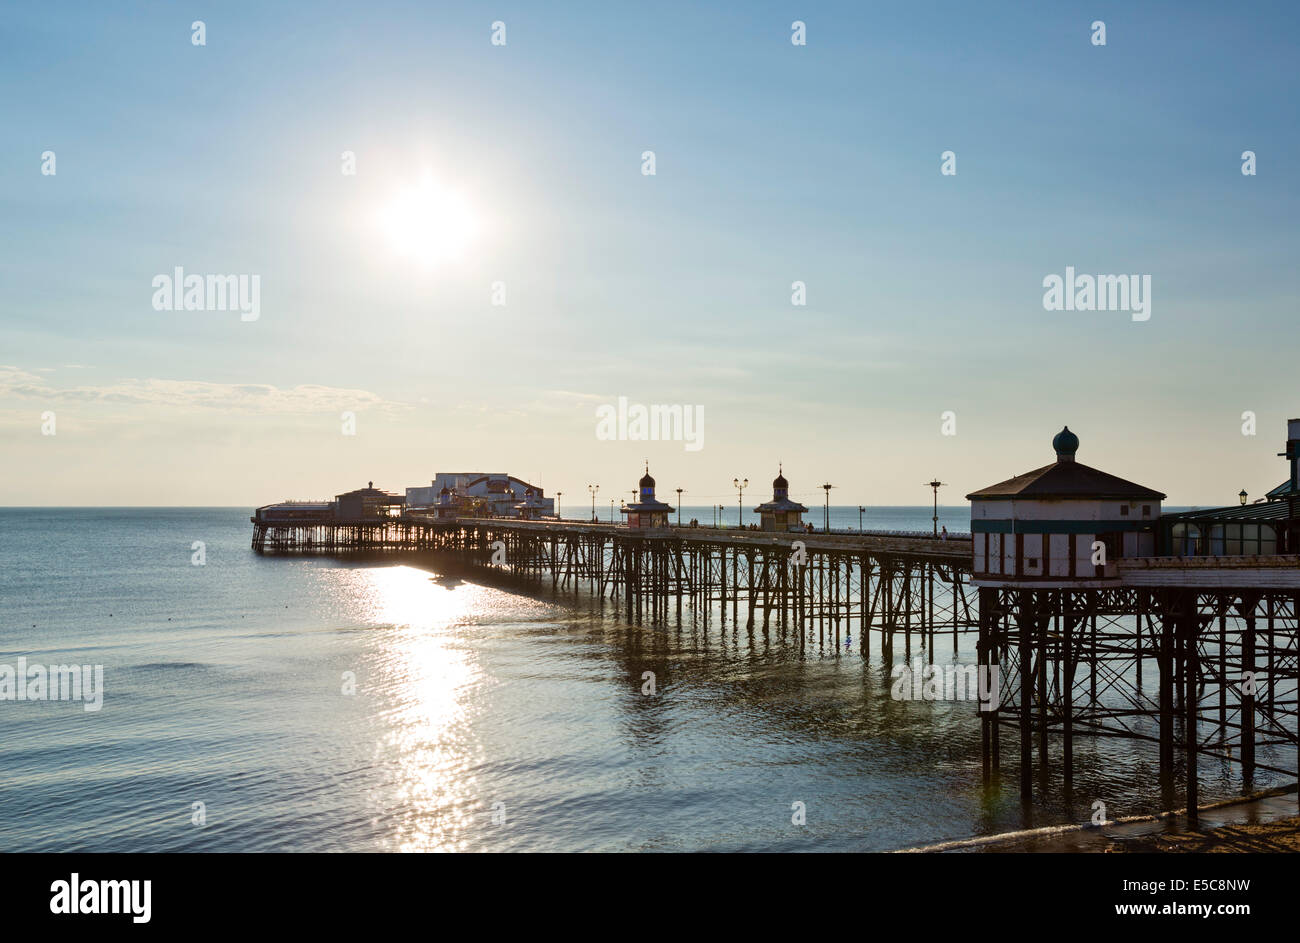 North Pier just before sunset, The Golden Mile, Blackpool, Lancashire, UK - Stock Image